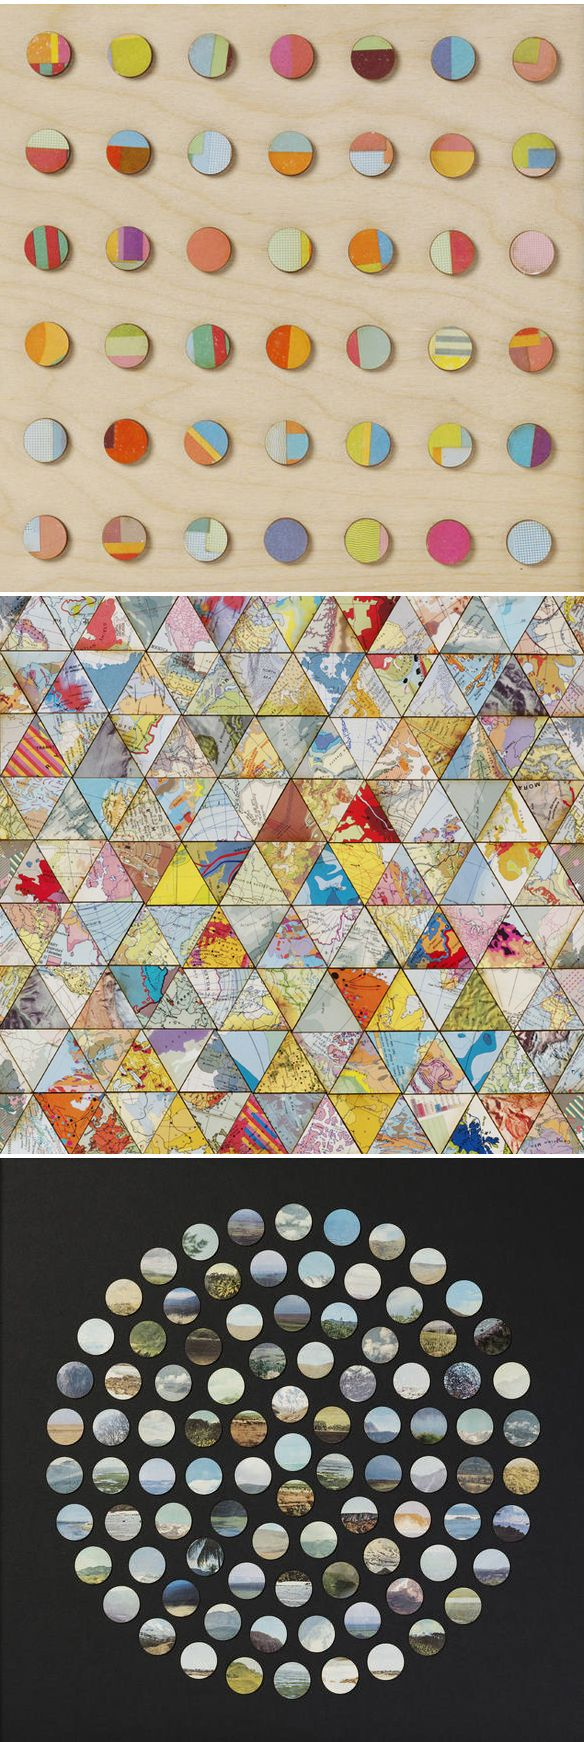 Amelia Coward - collage (vintage paper, maps, and skies!)